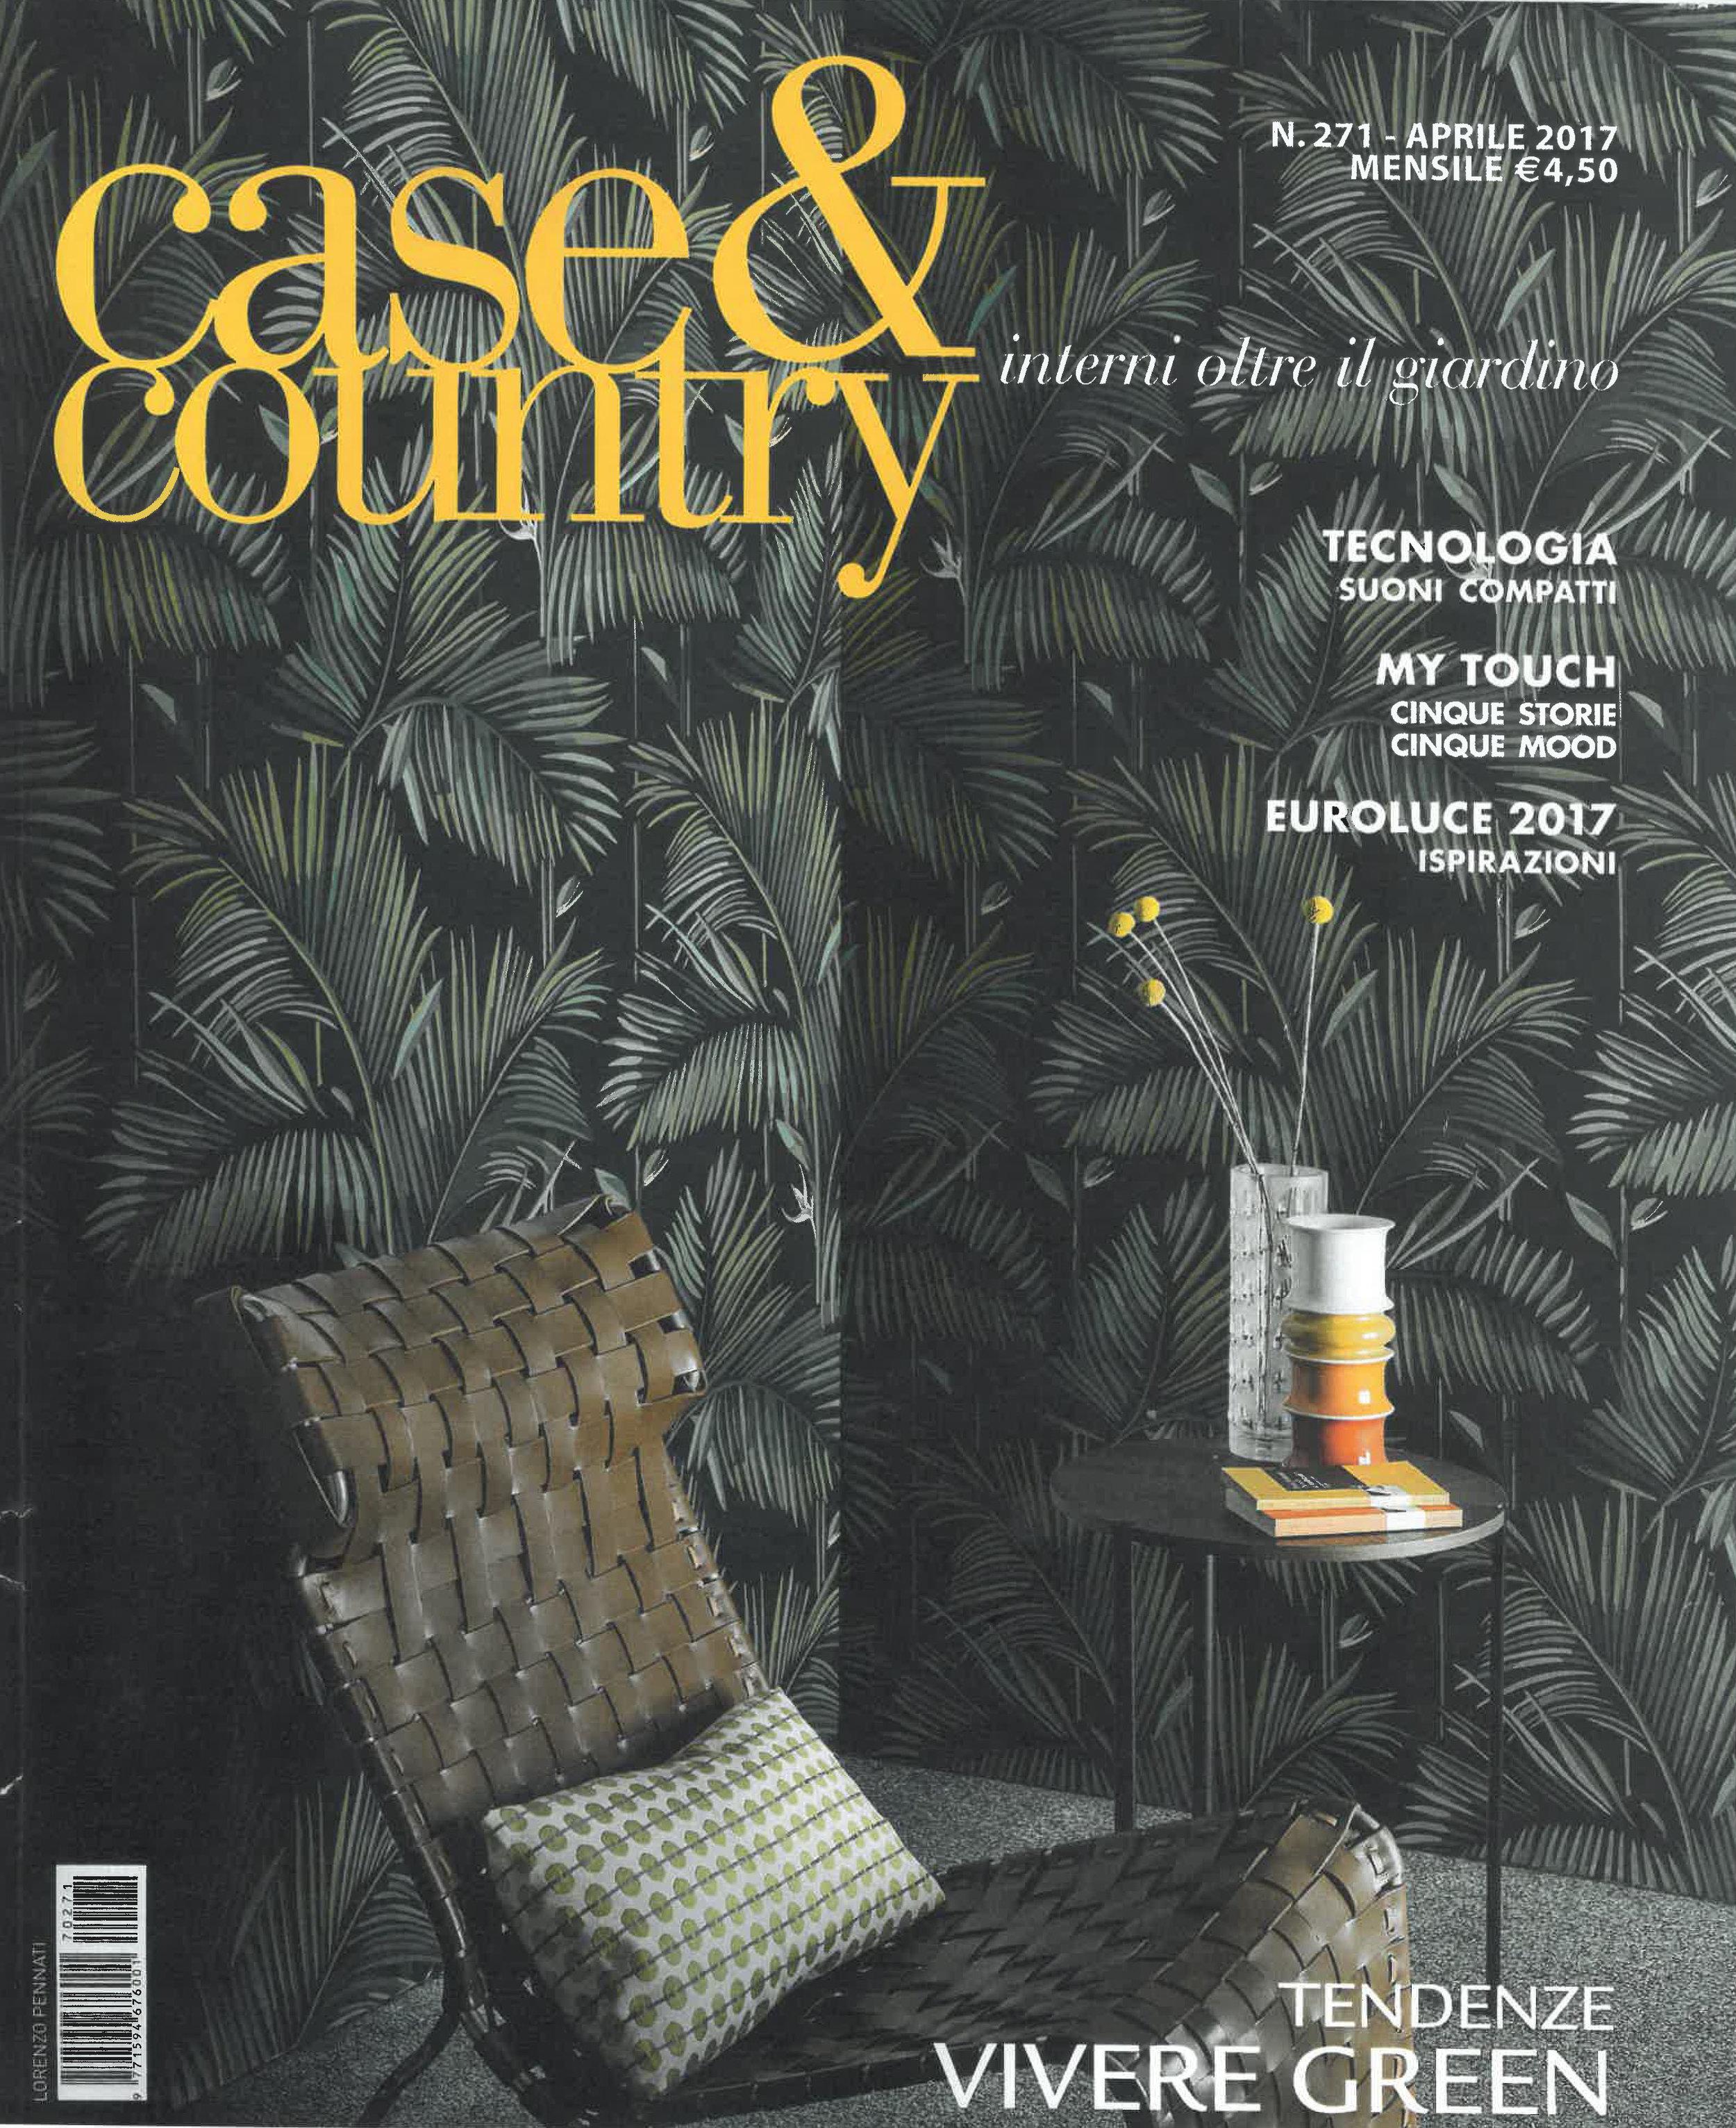 case&country-1.jpg